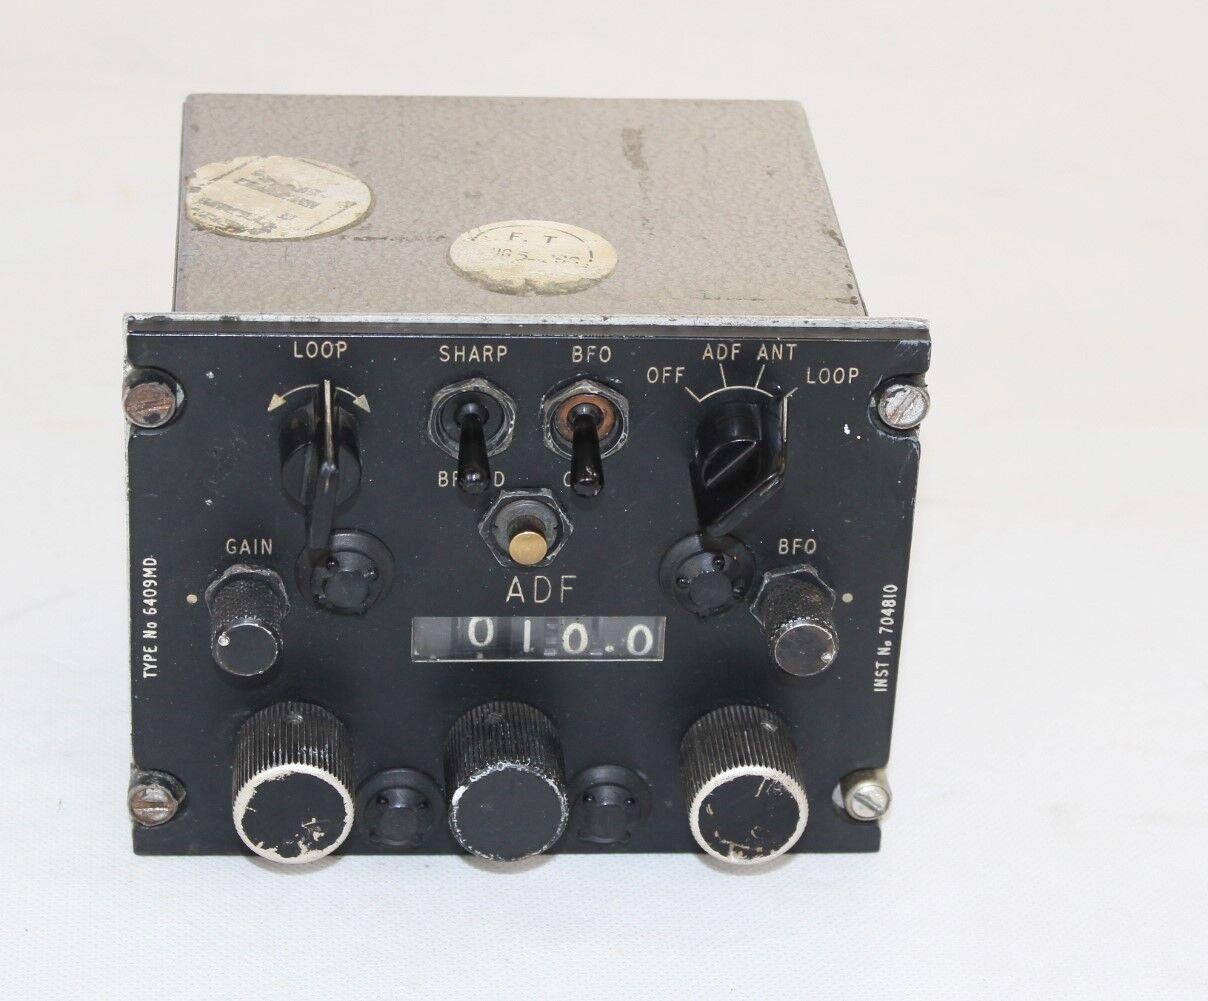 Marconi Control ADF WR.638 6409 MD Aircraft